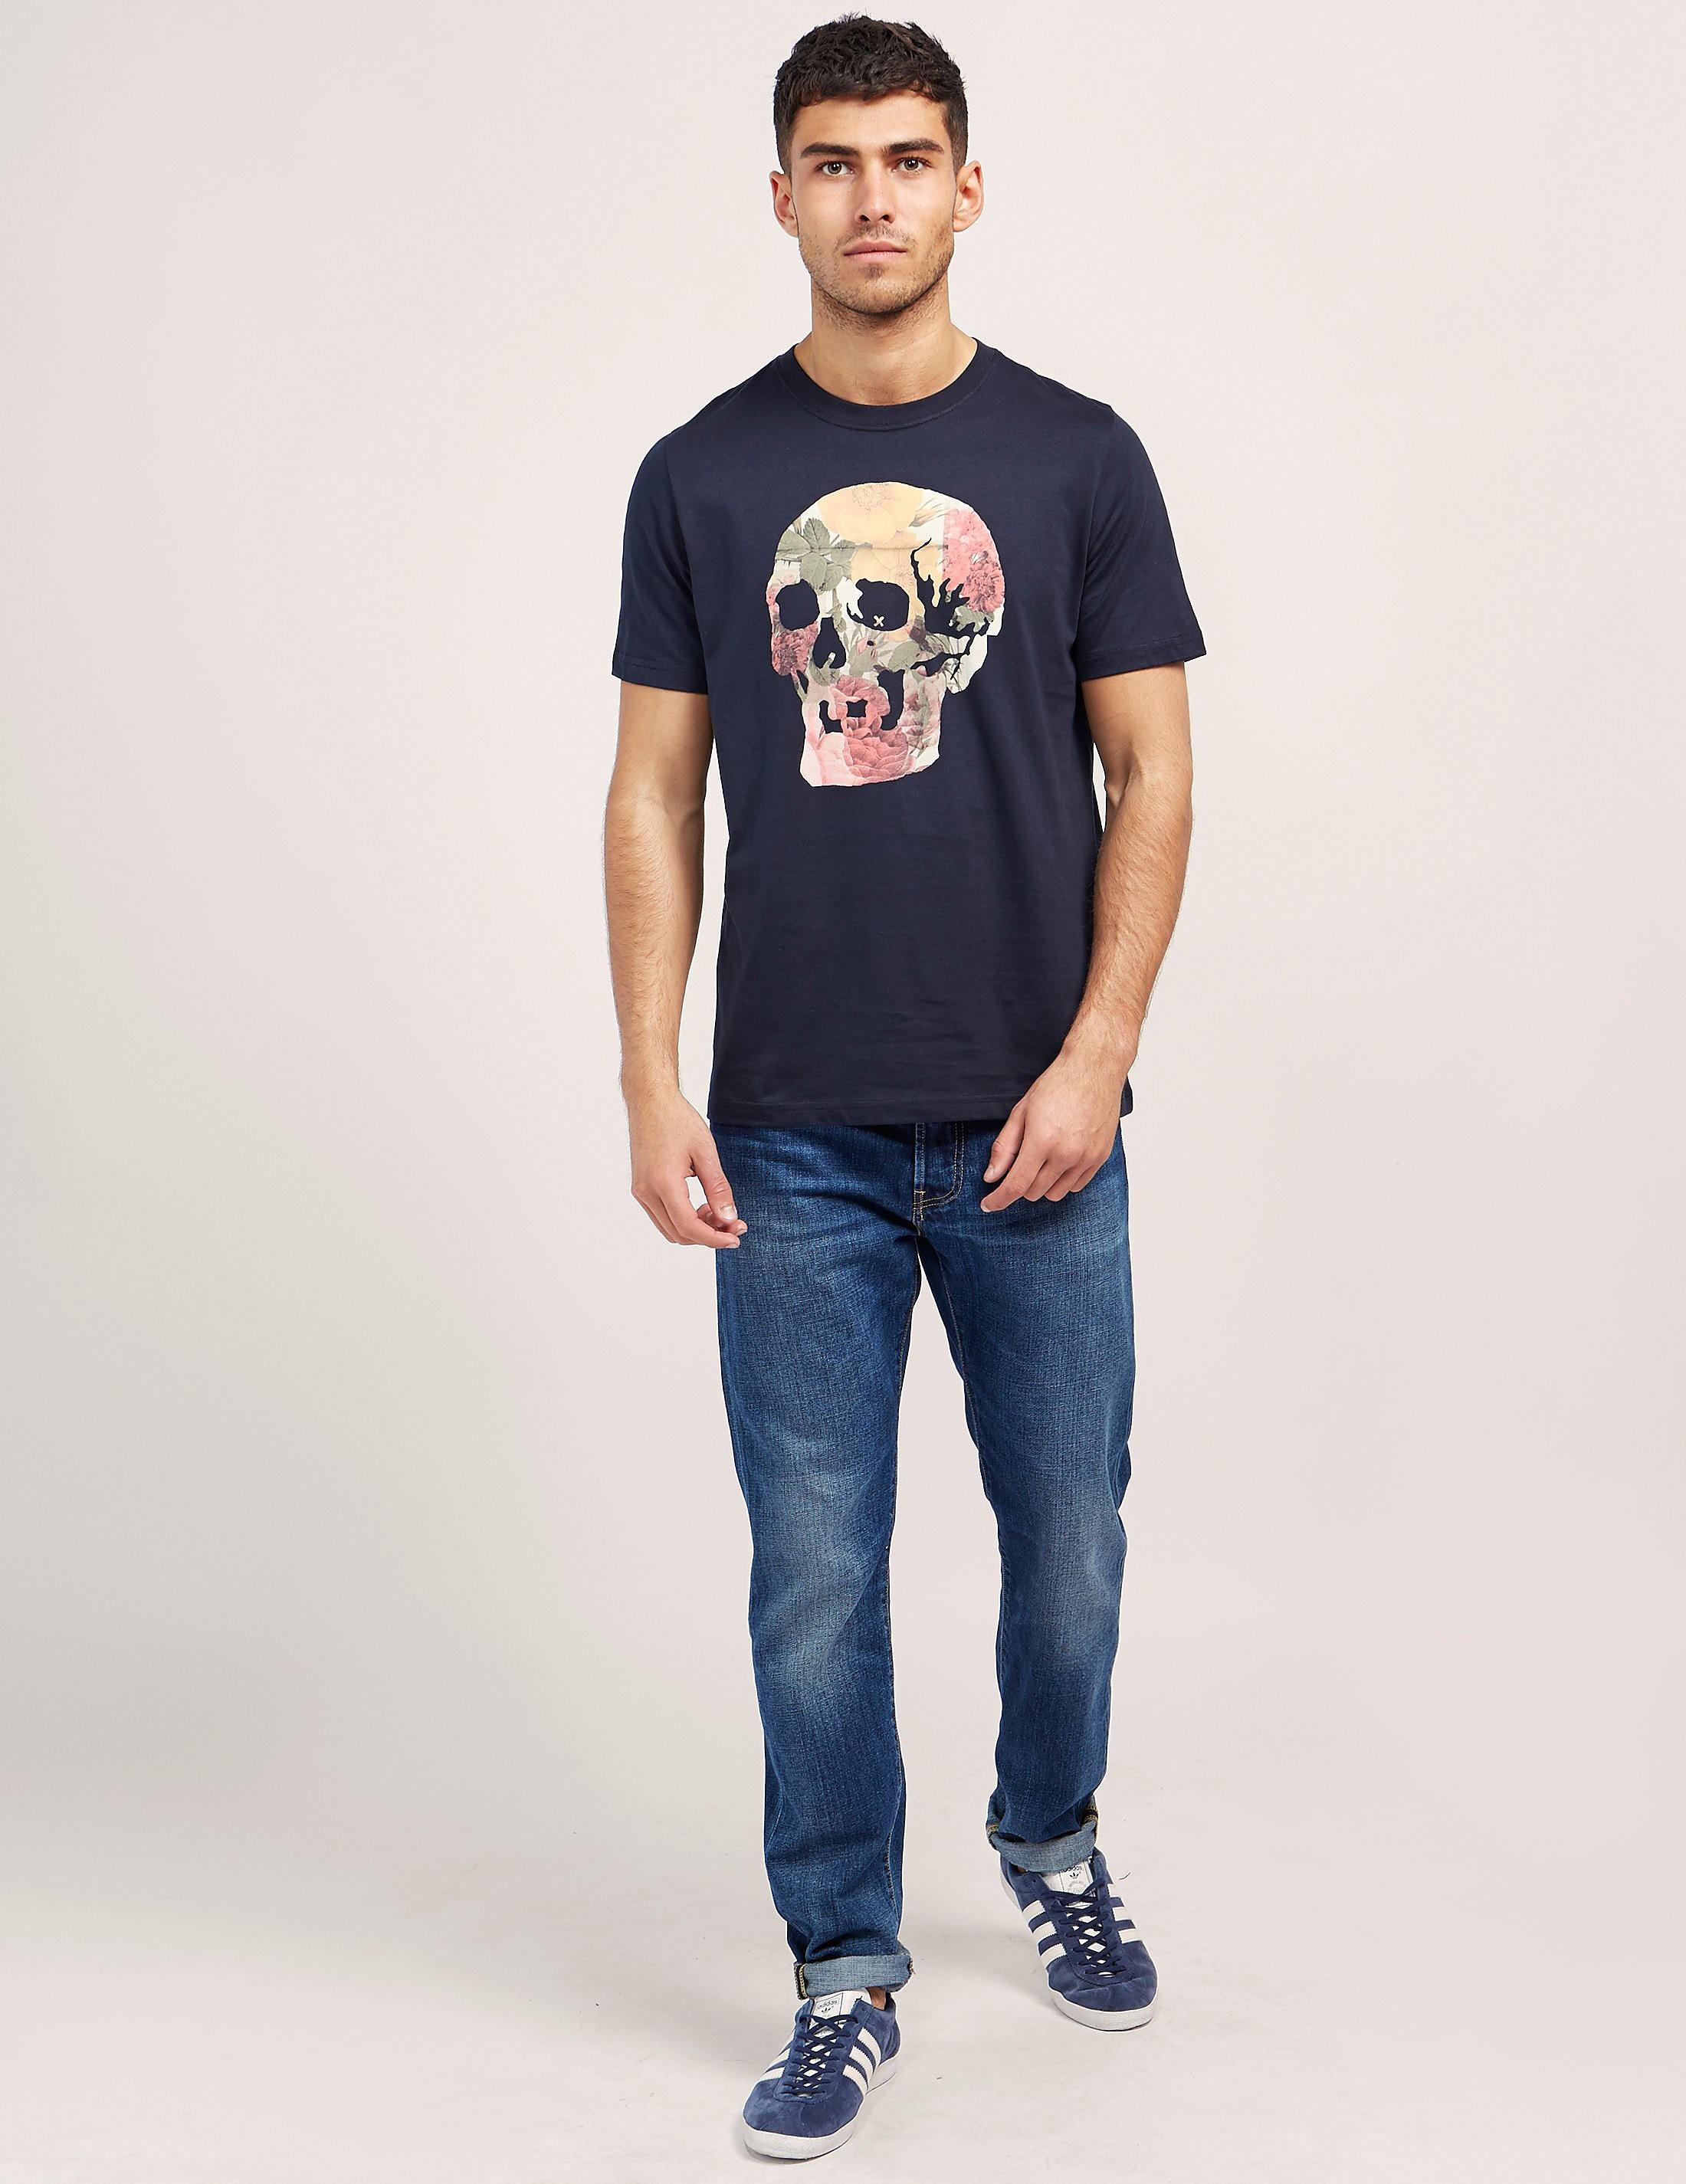 Paul Smith Floral Skull Short Sleeve T-Shirt